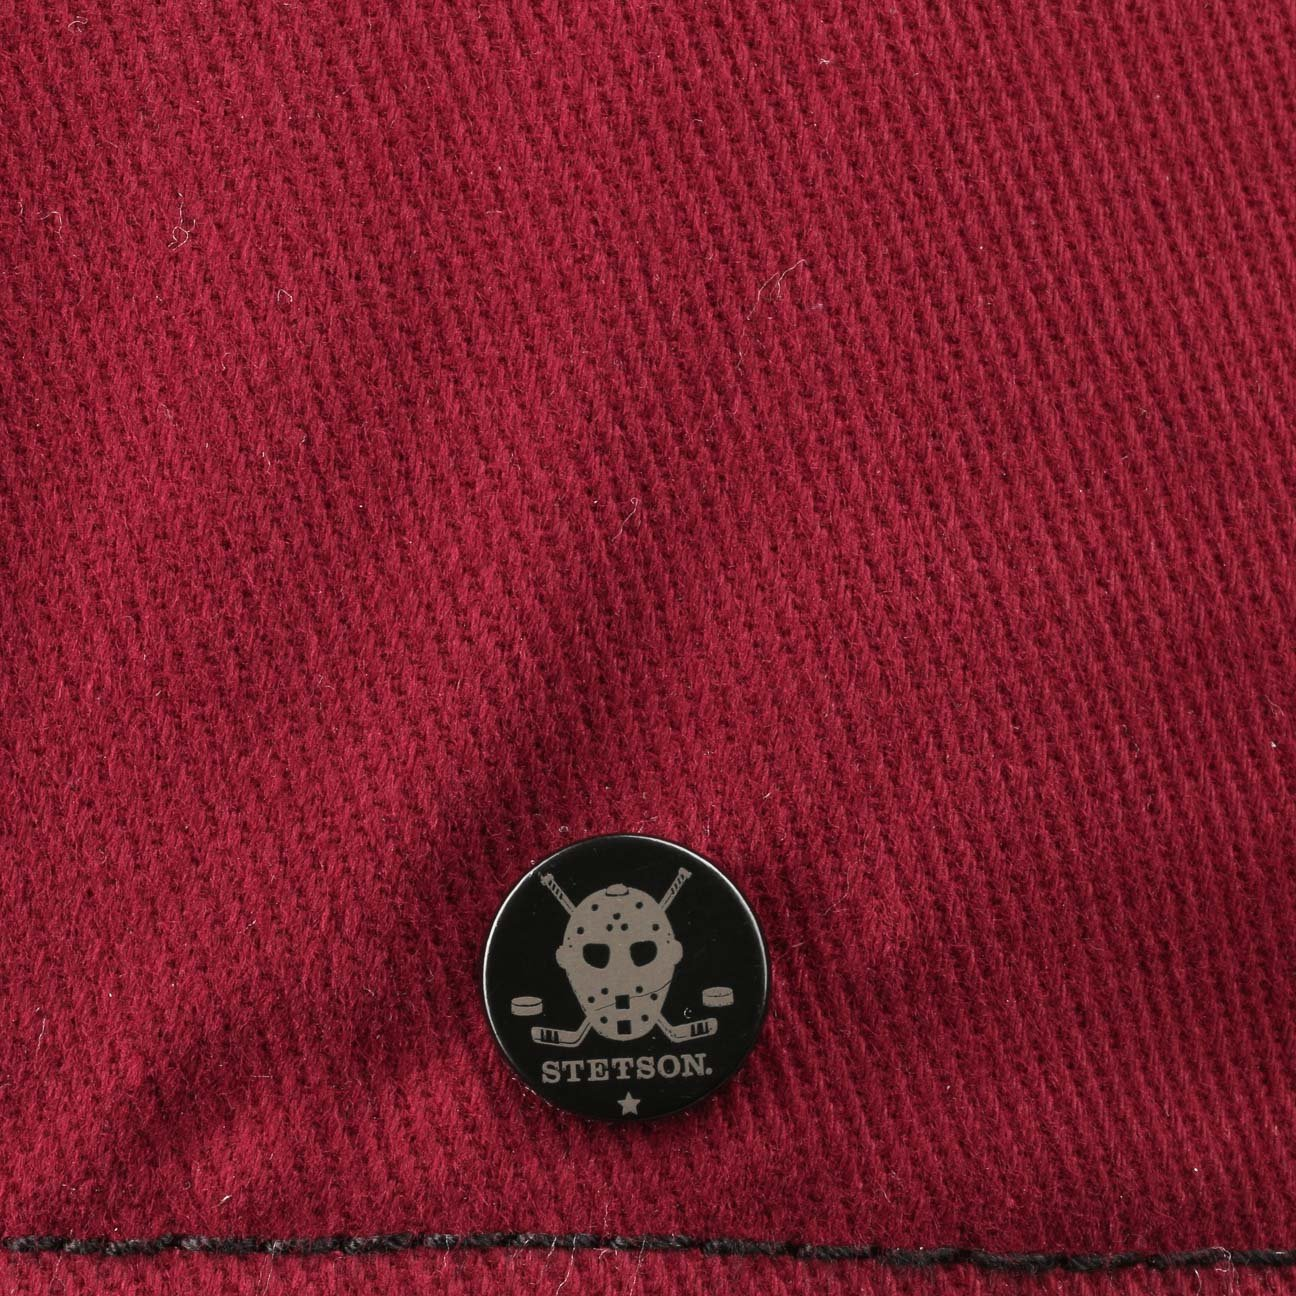 Stetson Gorra Cali Twill Snapback by baseballgorra algodón (Talla única -  Rojo)  Amazon.es  Ropa y accesorios 867cf0b0909